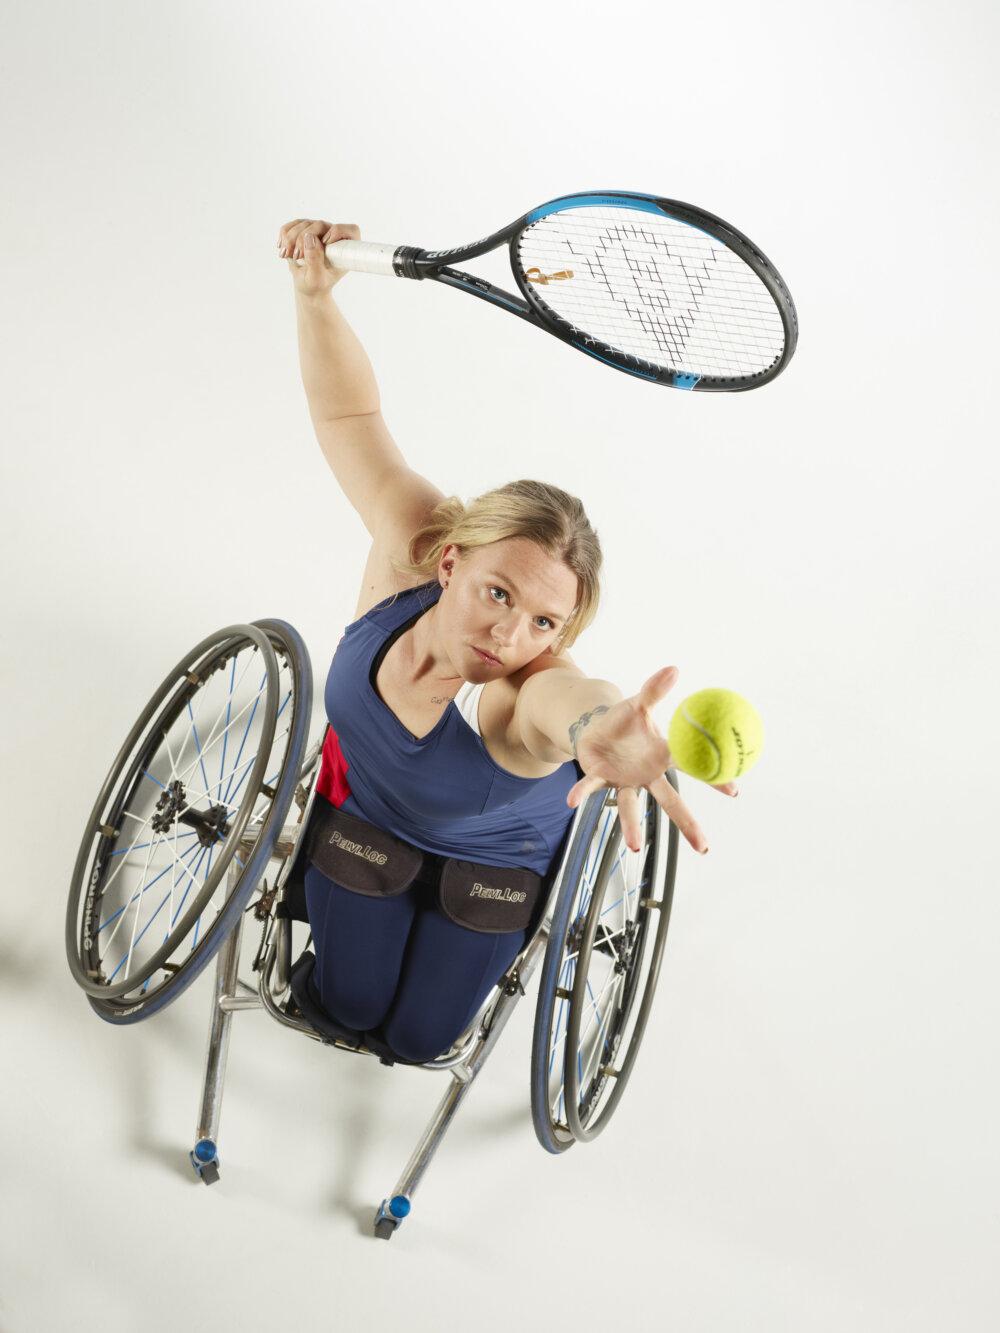 Jordanne Whiley, British wheelchair tennis player, portrair by ©Nathan Gallagher